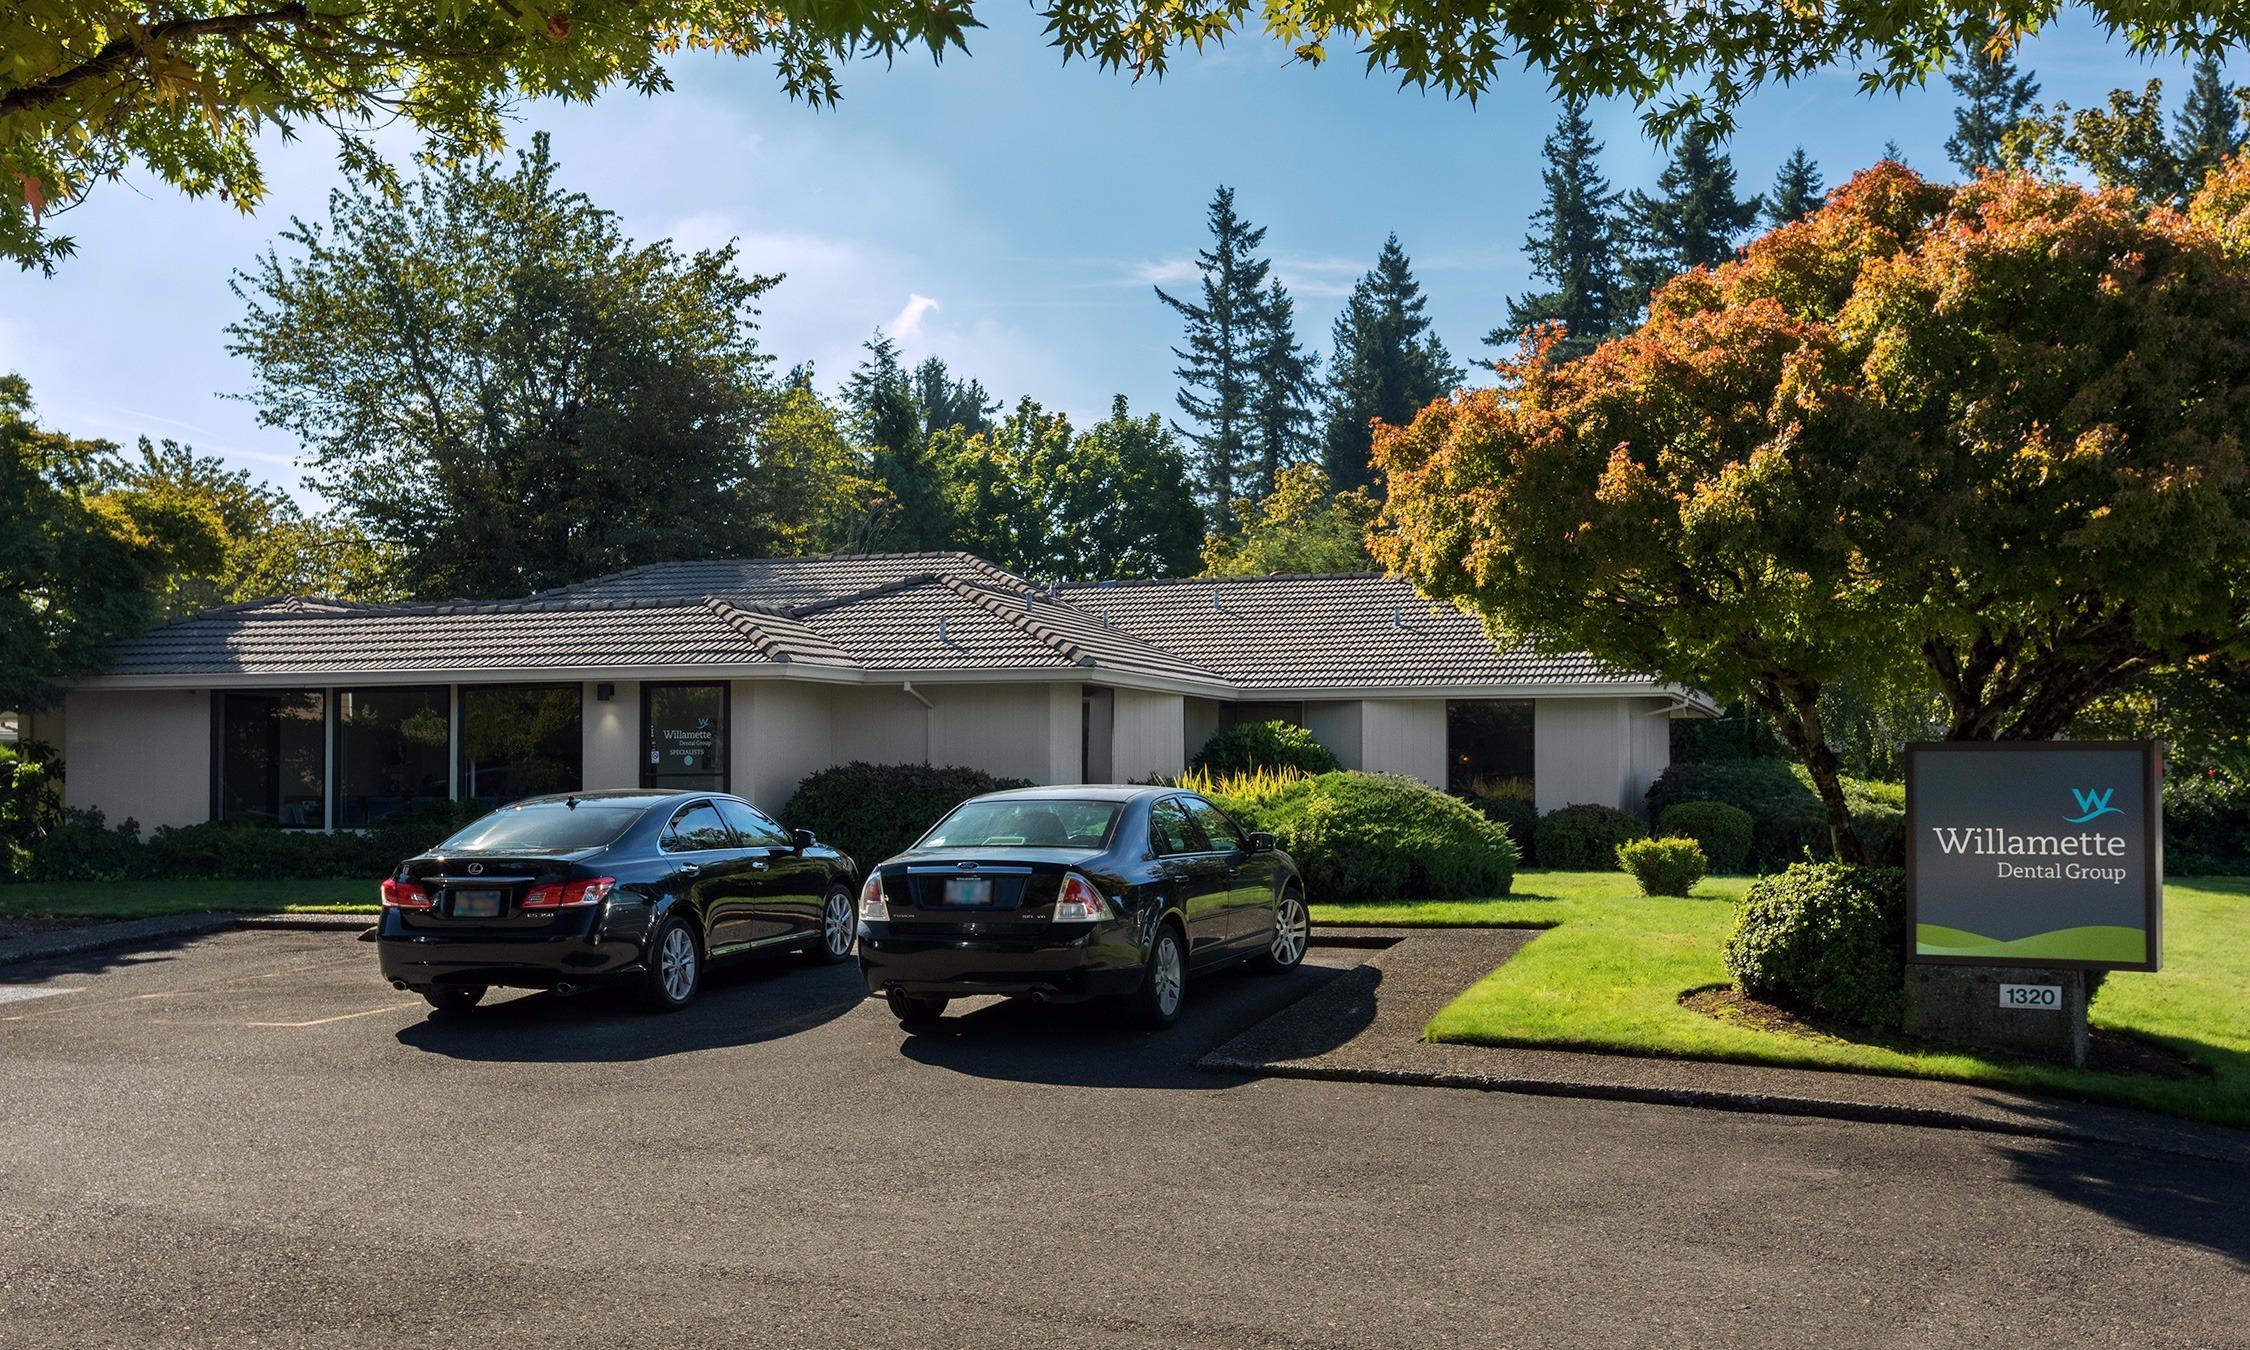 Willamette Dental Group - Portland - Gateway Specialty - Closed image 0